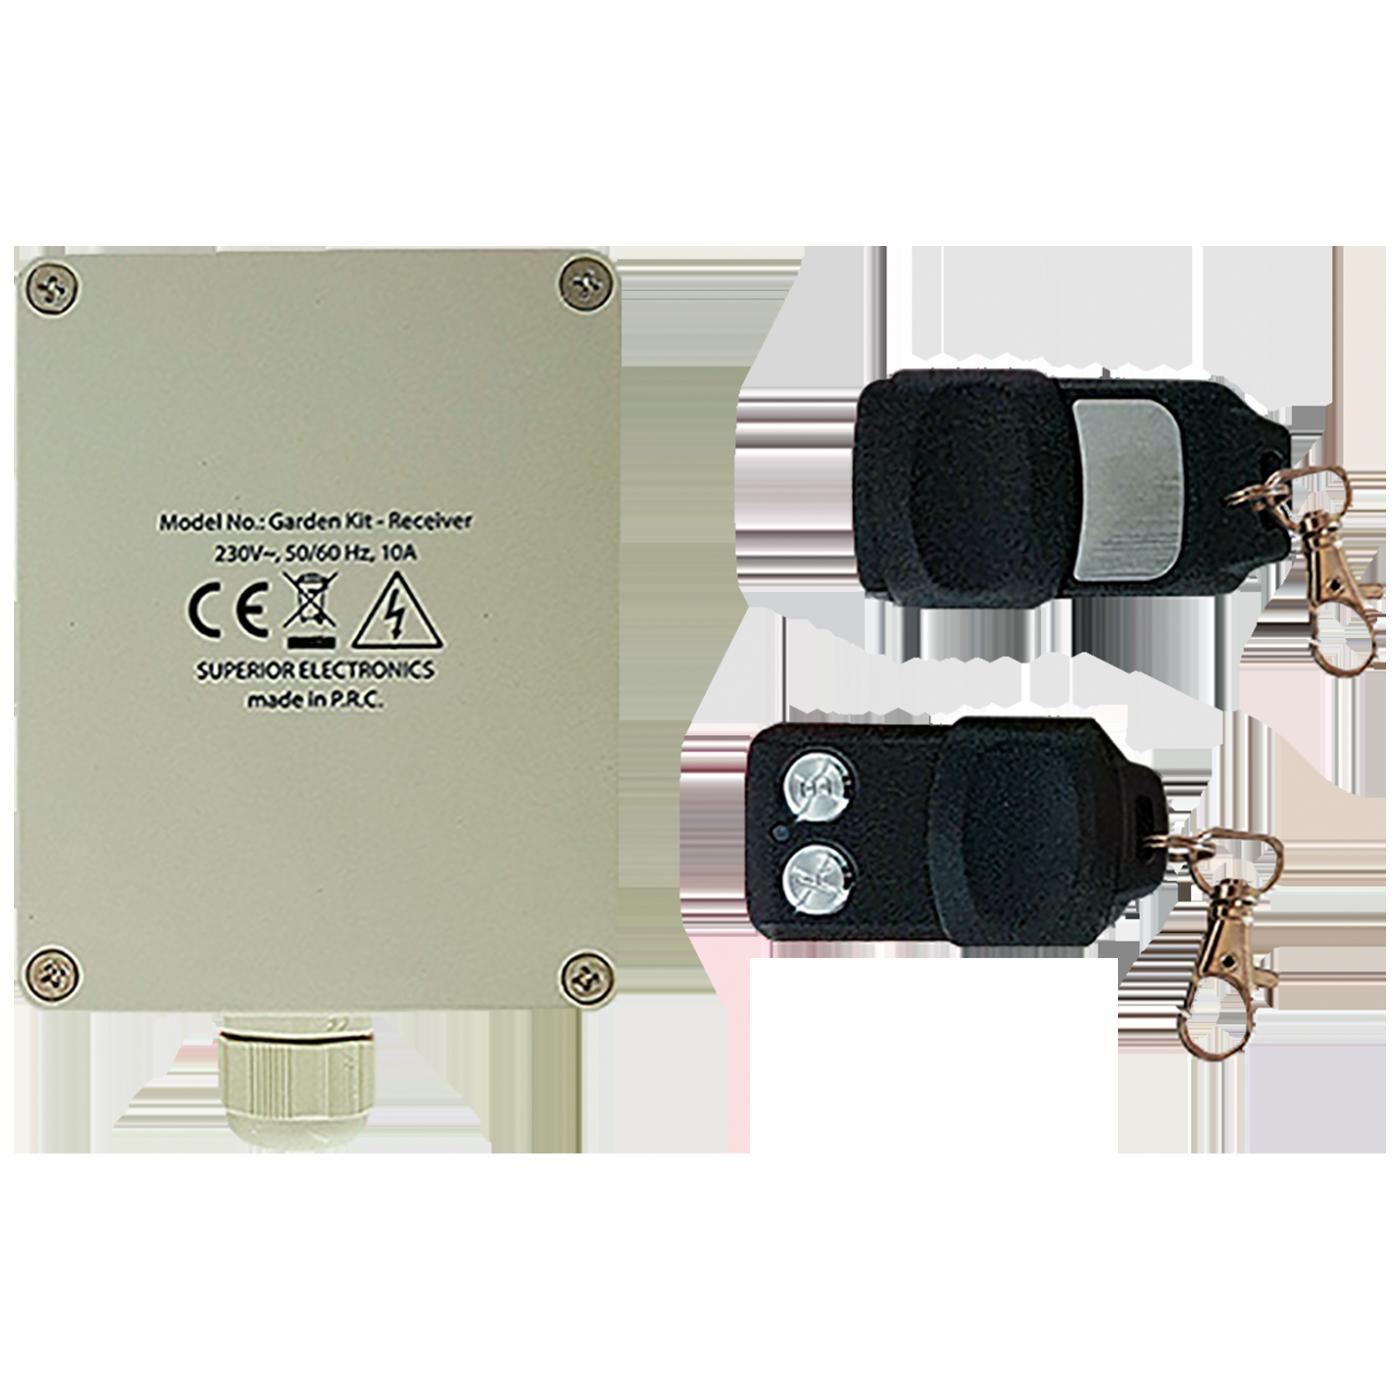 Set za daljinsko upravljanje, 2 kanala, 2RC-a, 433 MHz